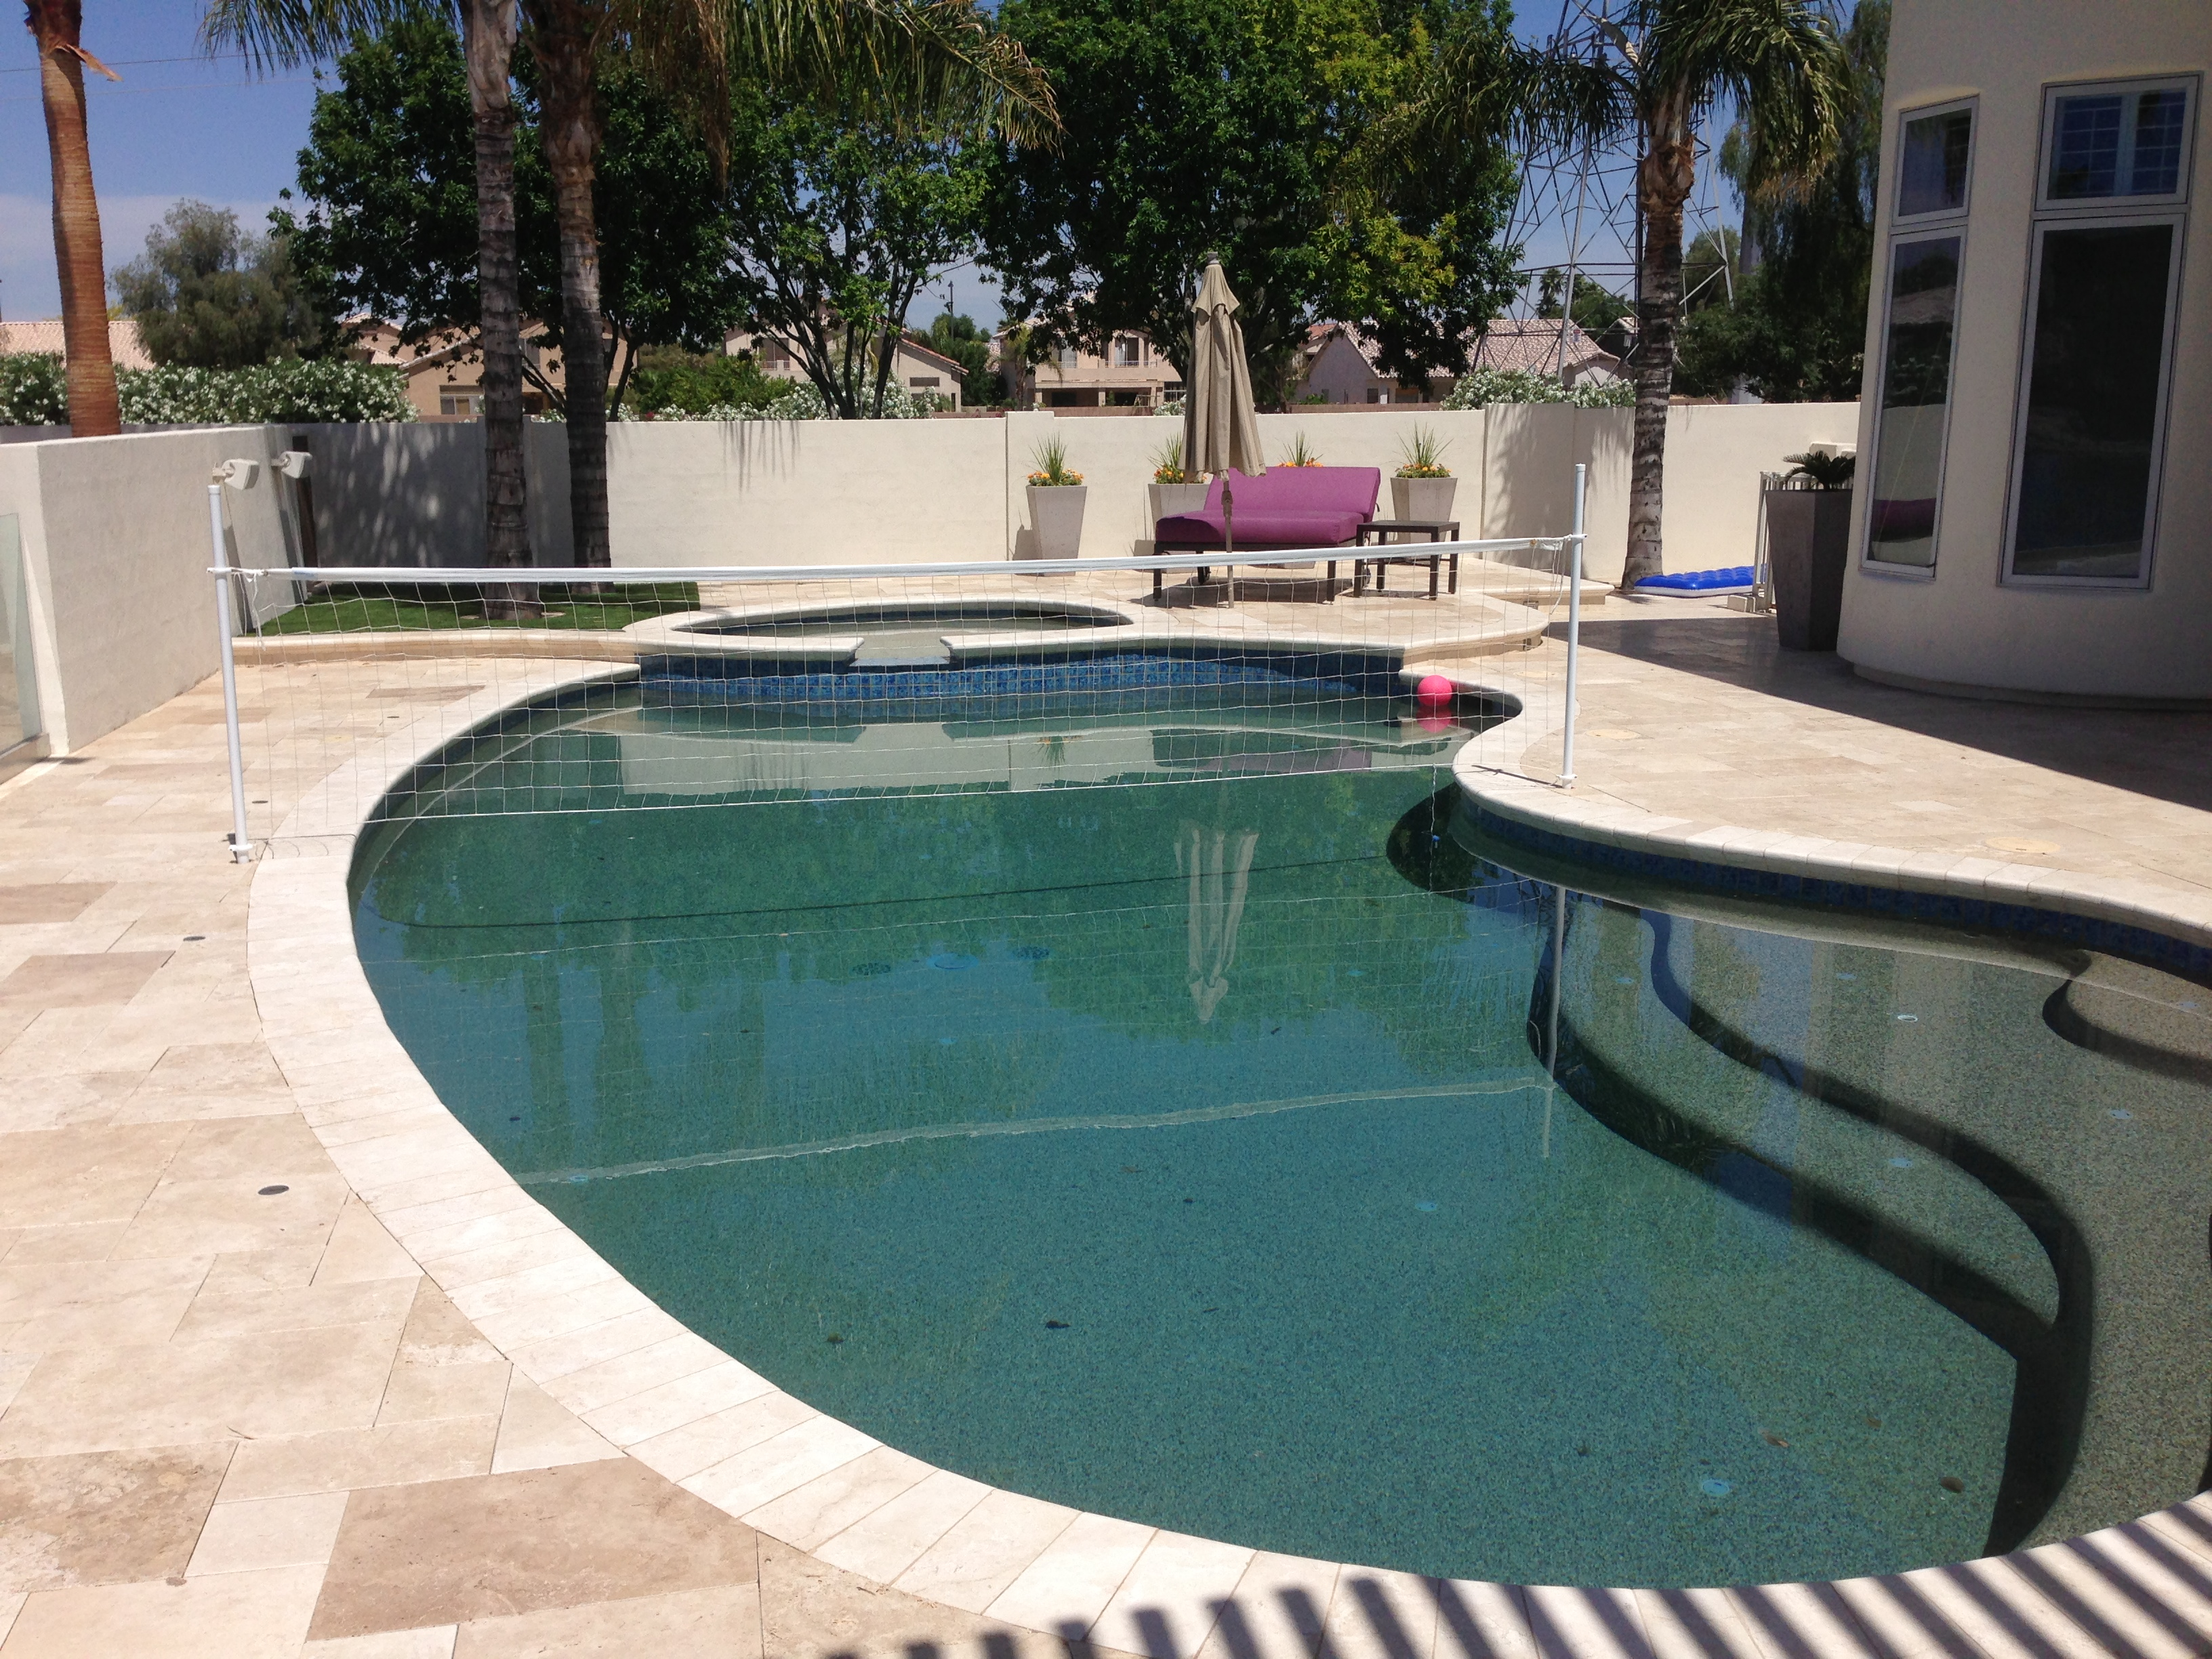 Pool decks portfolio for Pool deck landscaping